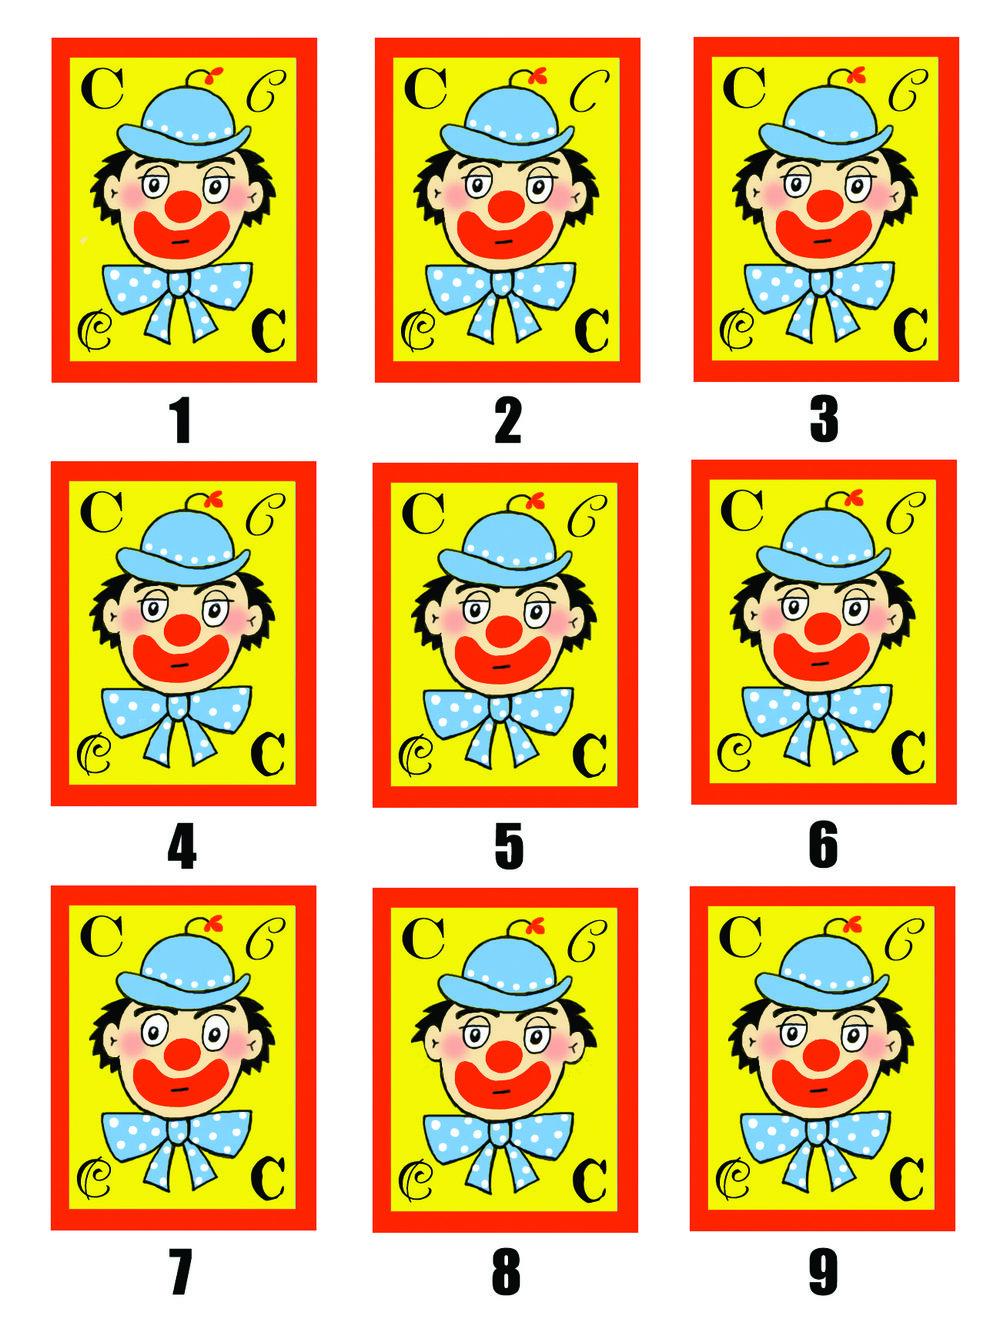 02_Koppelen - clown - 5=9.jpg